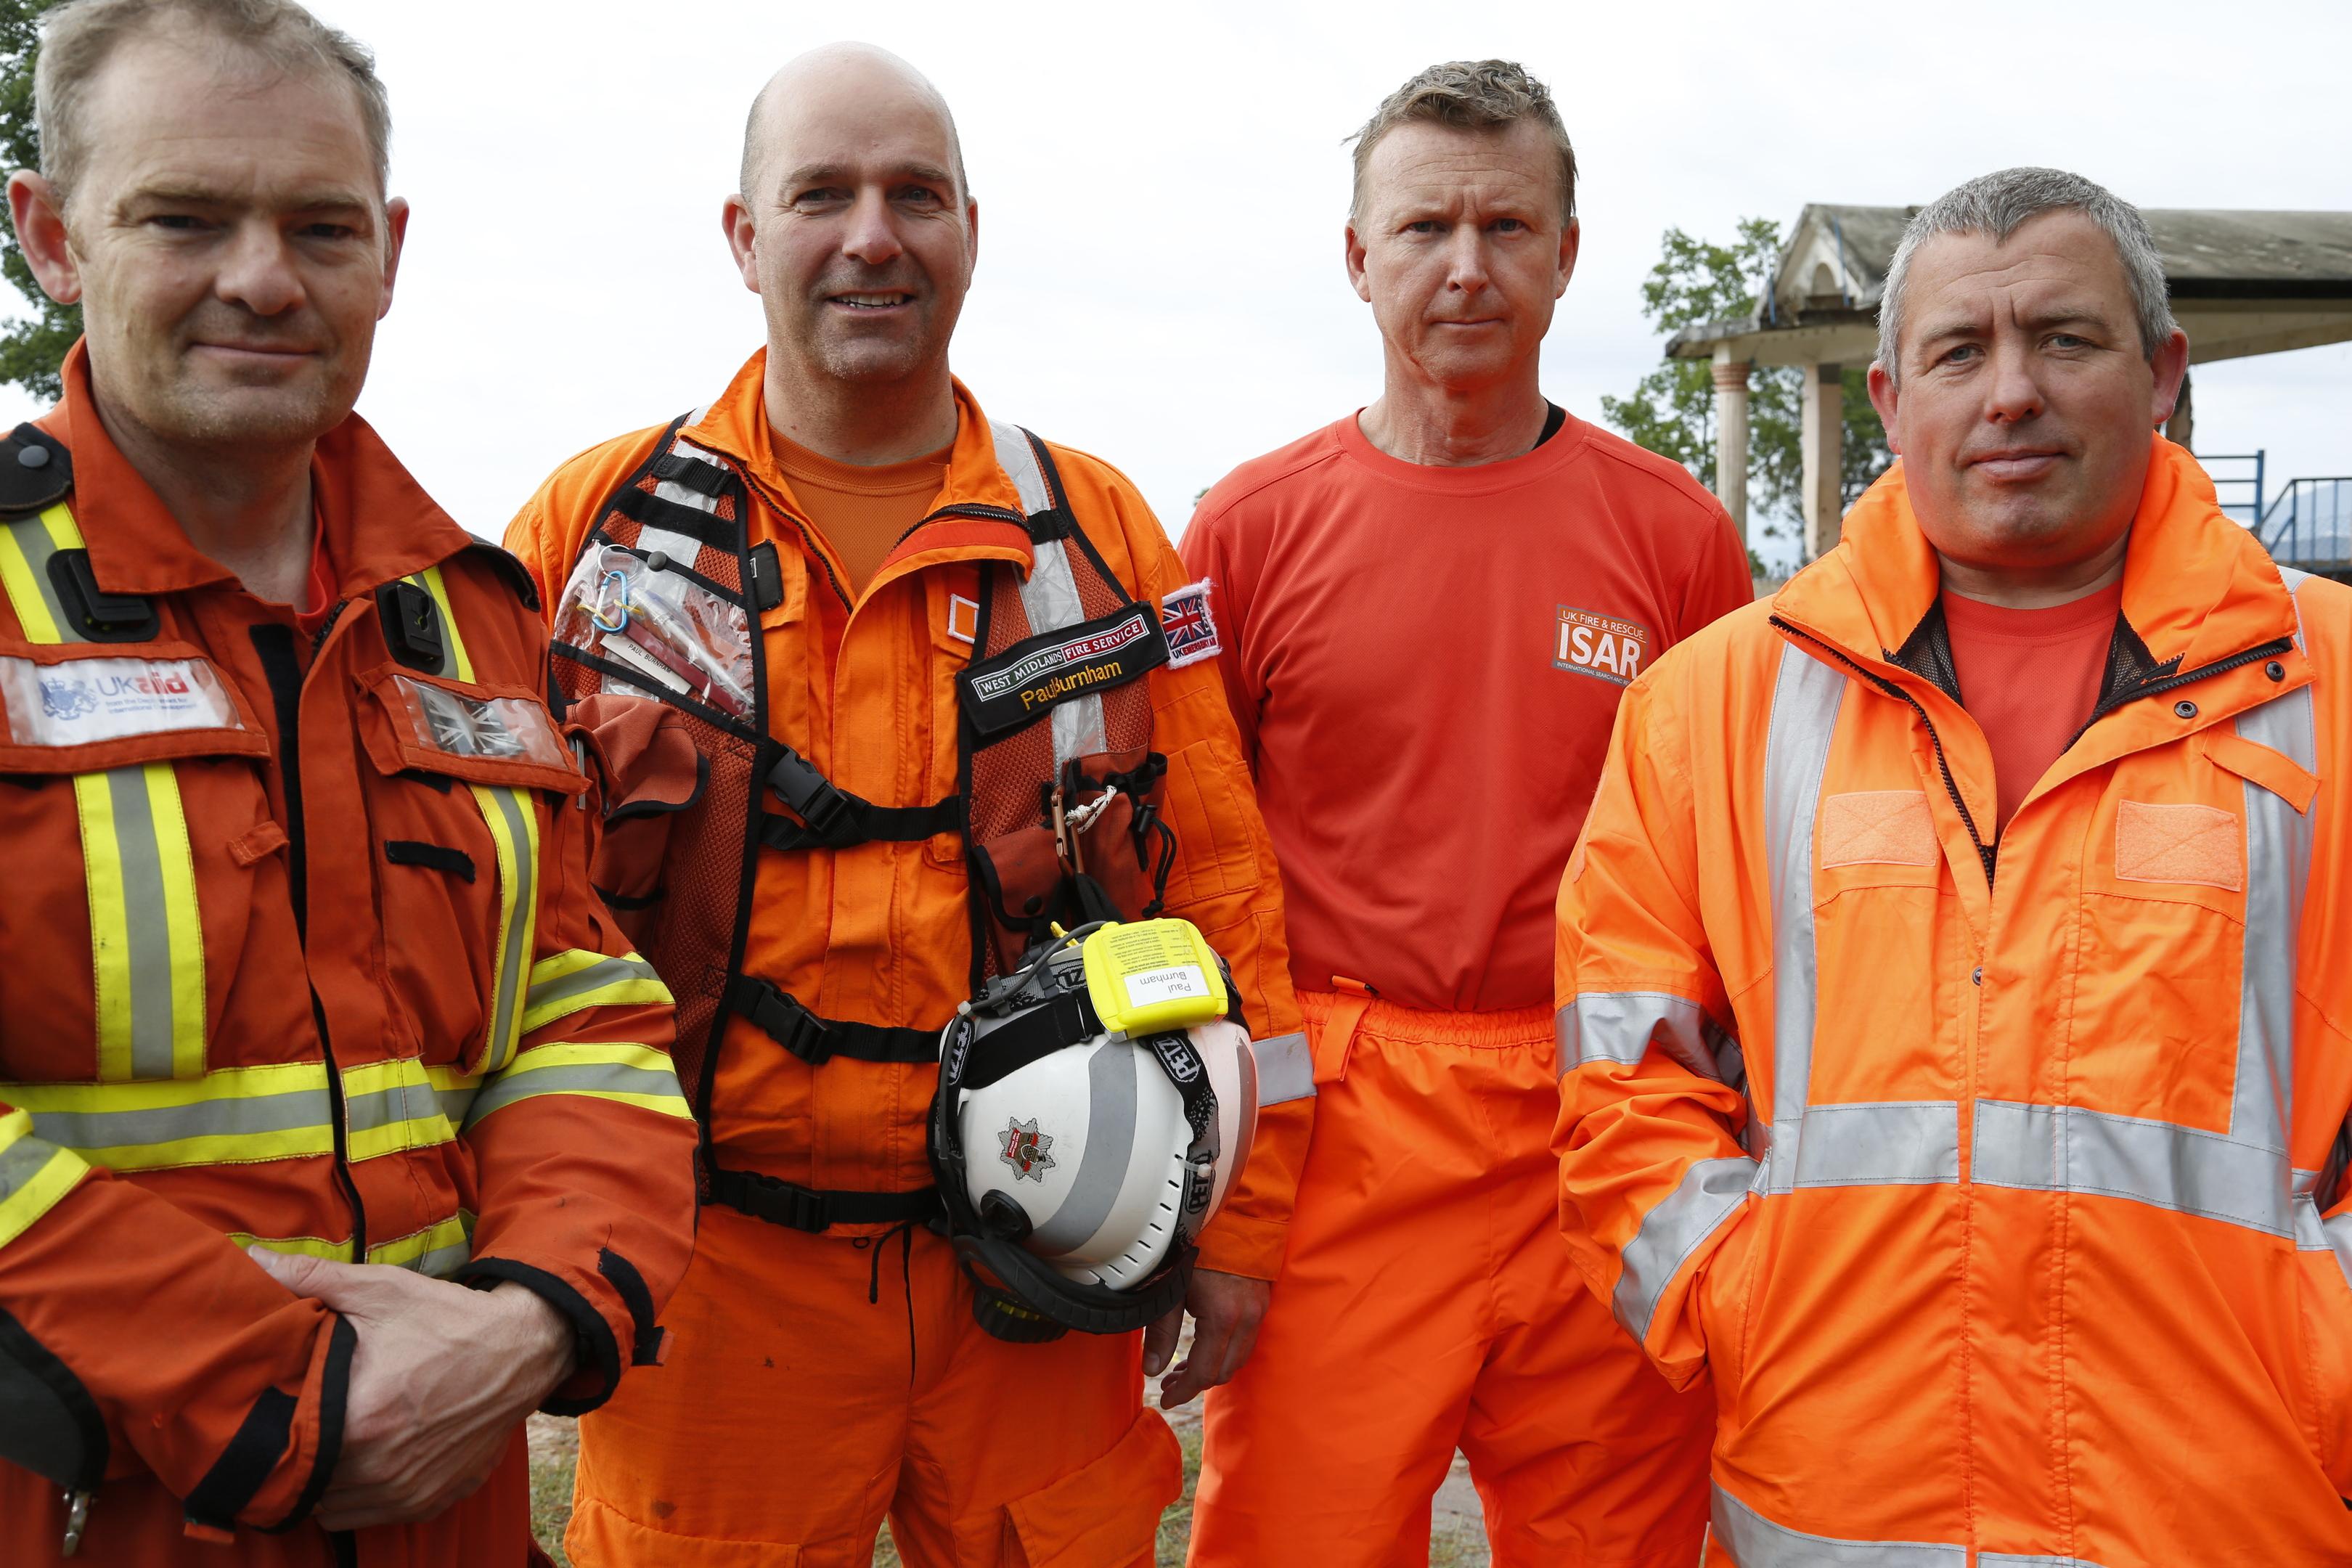 rom L - R Dr Malcolm Russell, Area Commander Paul Burnham, West Mids Fire and Rescue, John Ball Essex dog handler, Gary Caroll SFRS dog handler